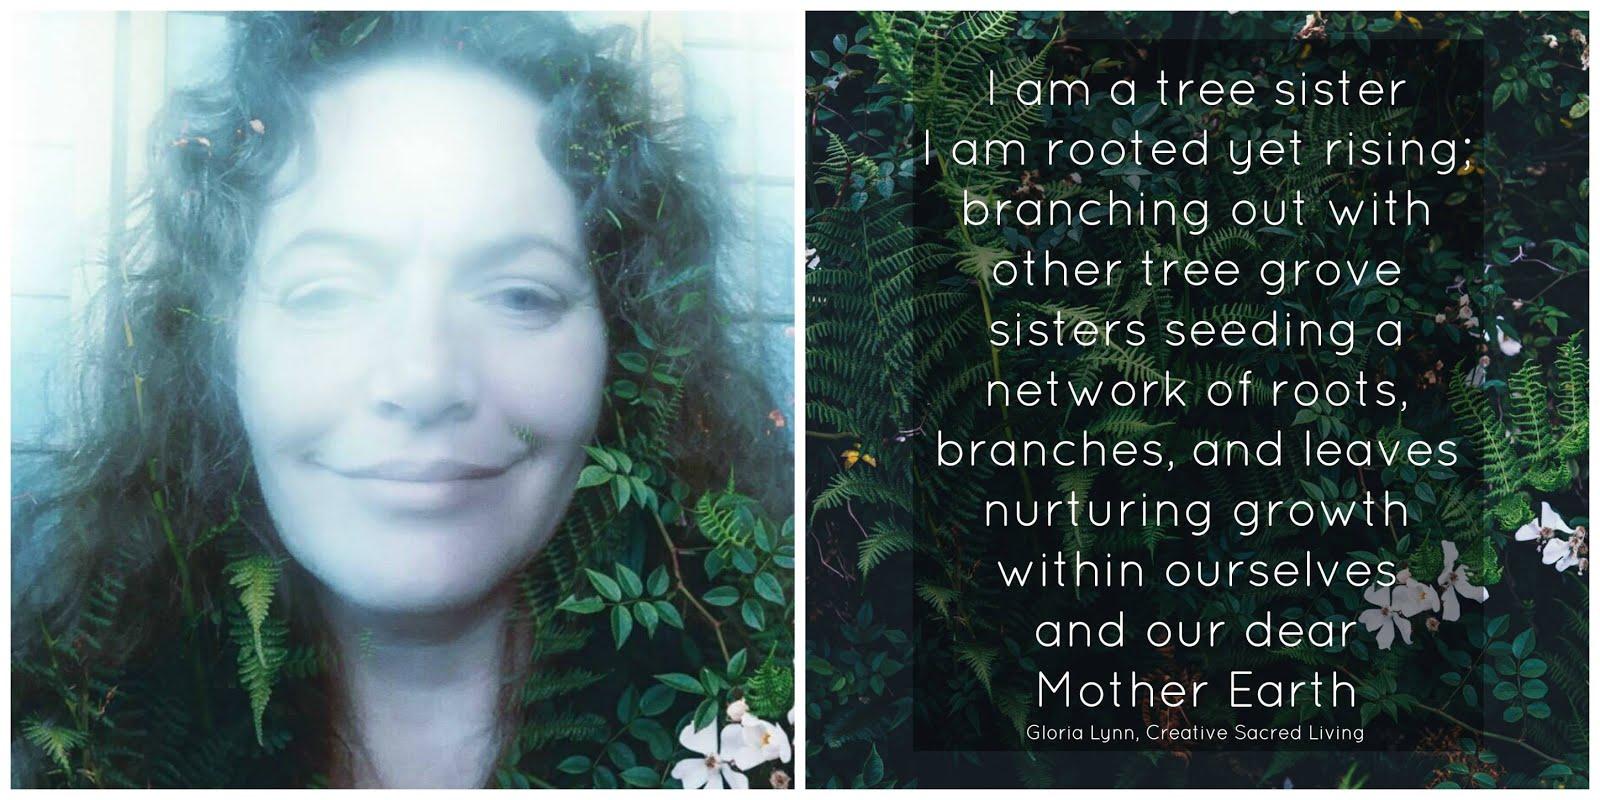 I Am a Treesister